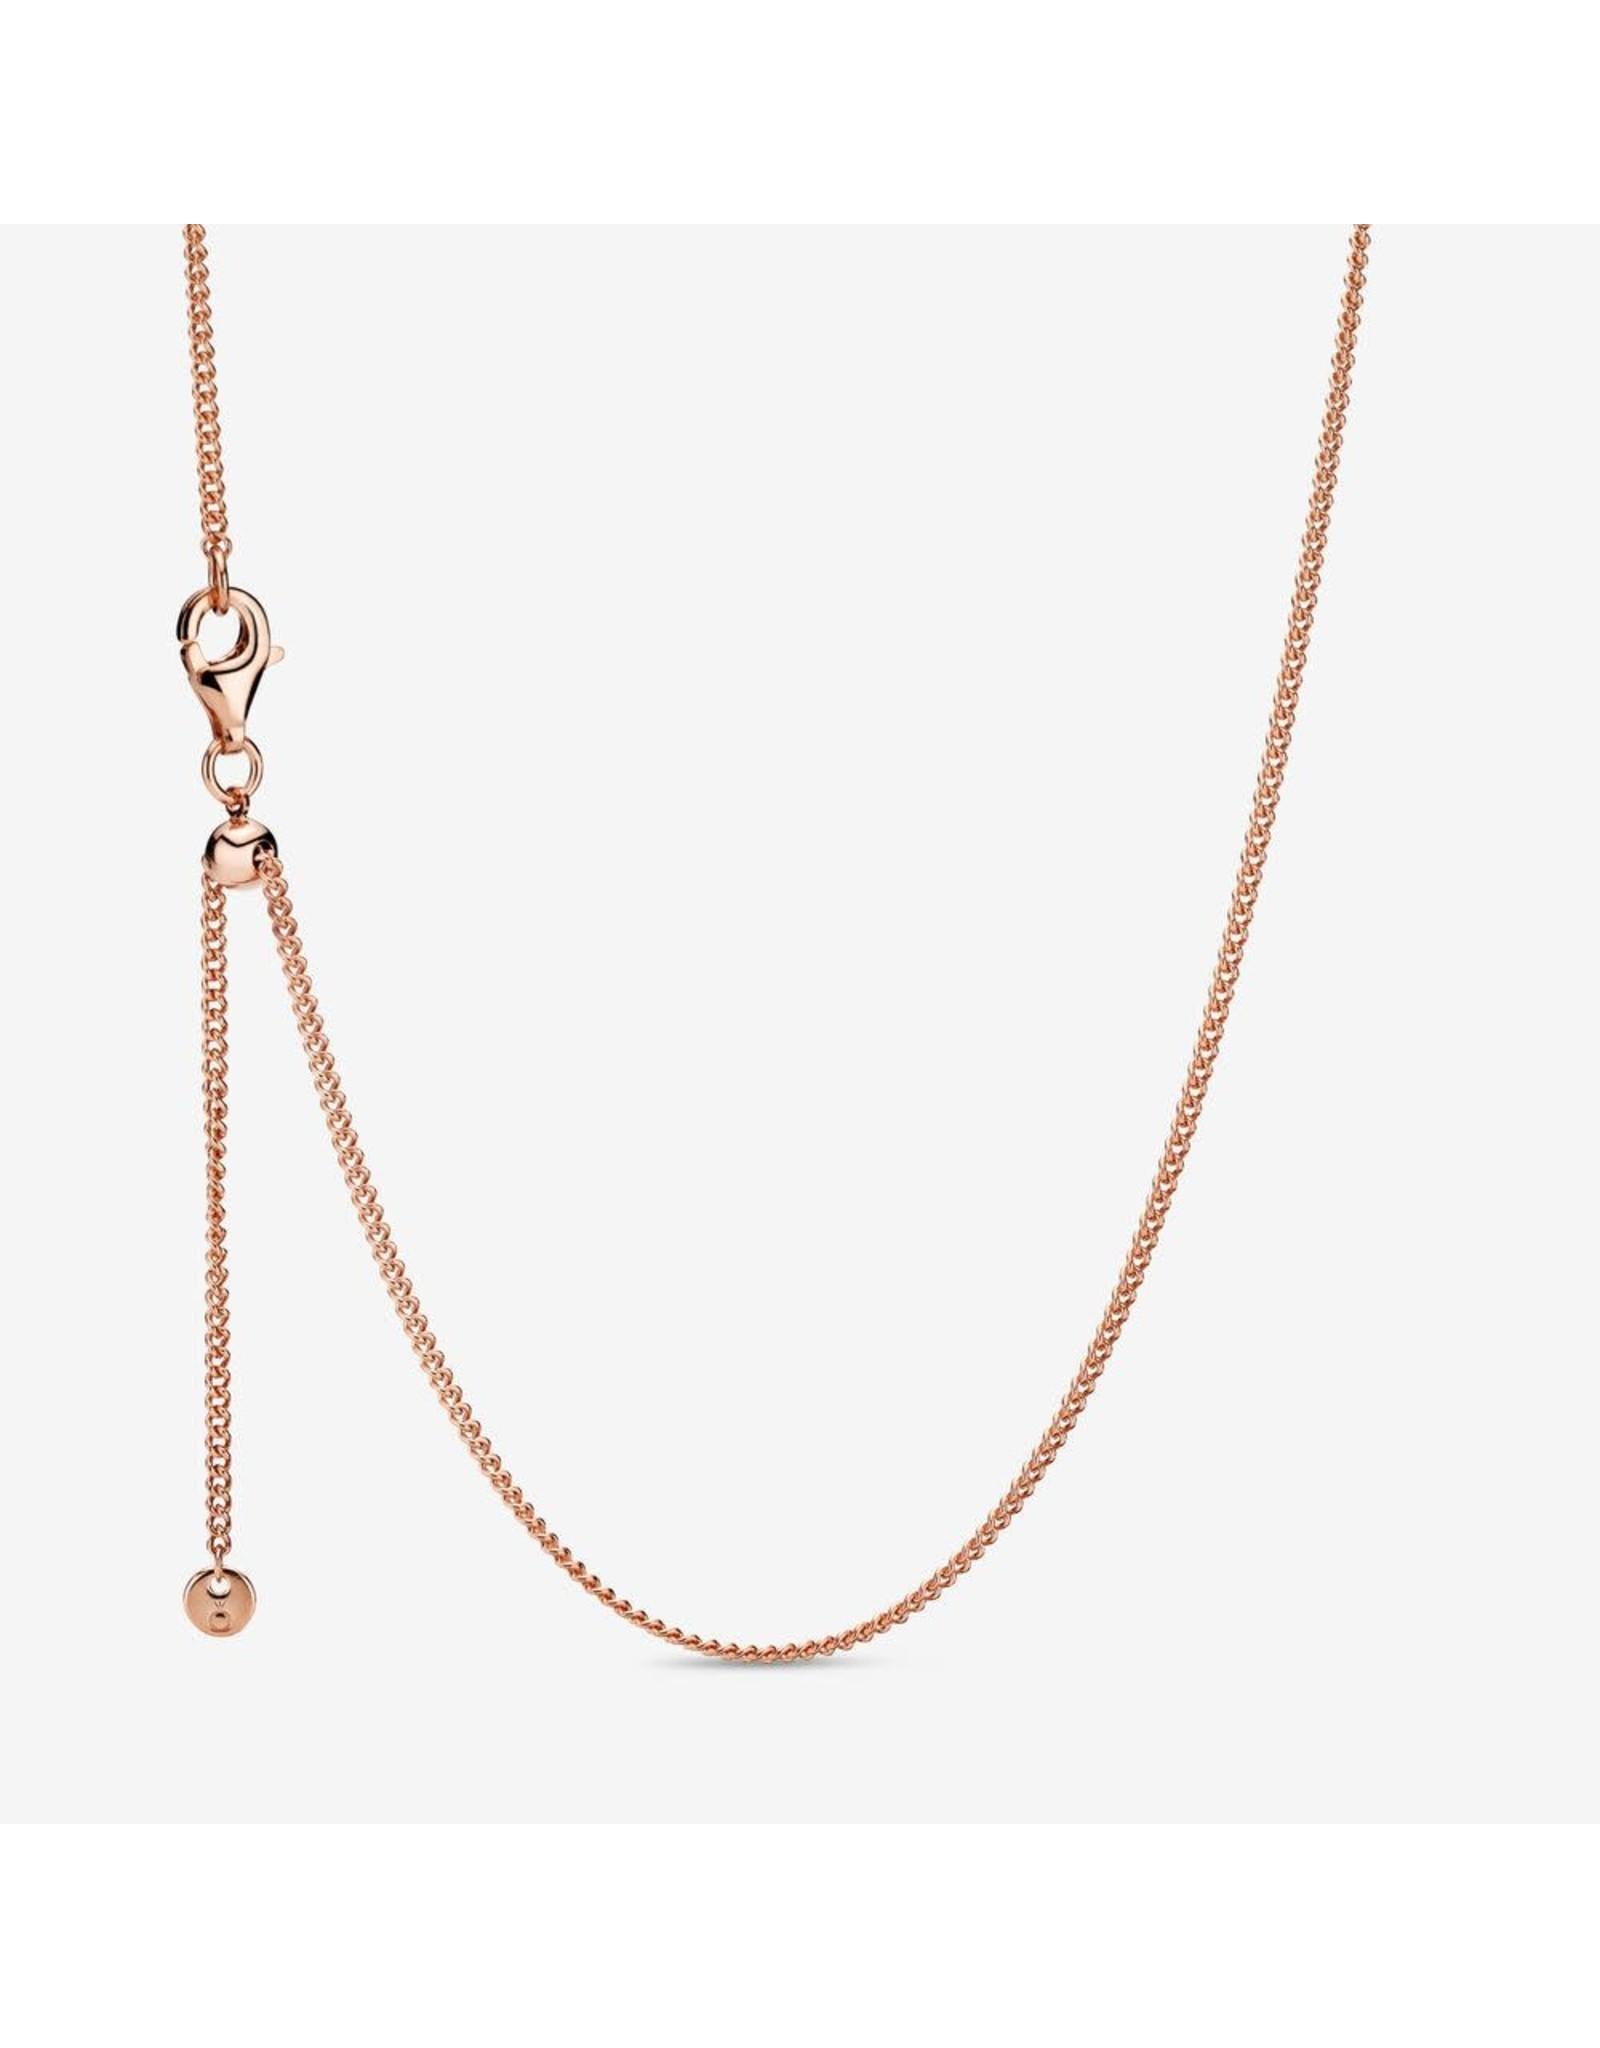 Pandora Pandora Rose Gold Necklace With Sliding Clasp 60 cm